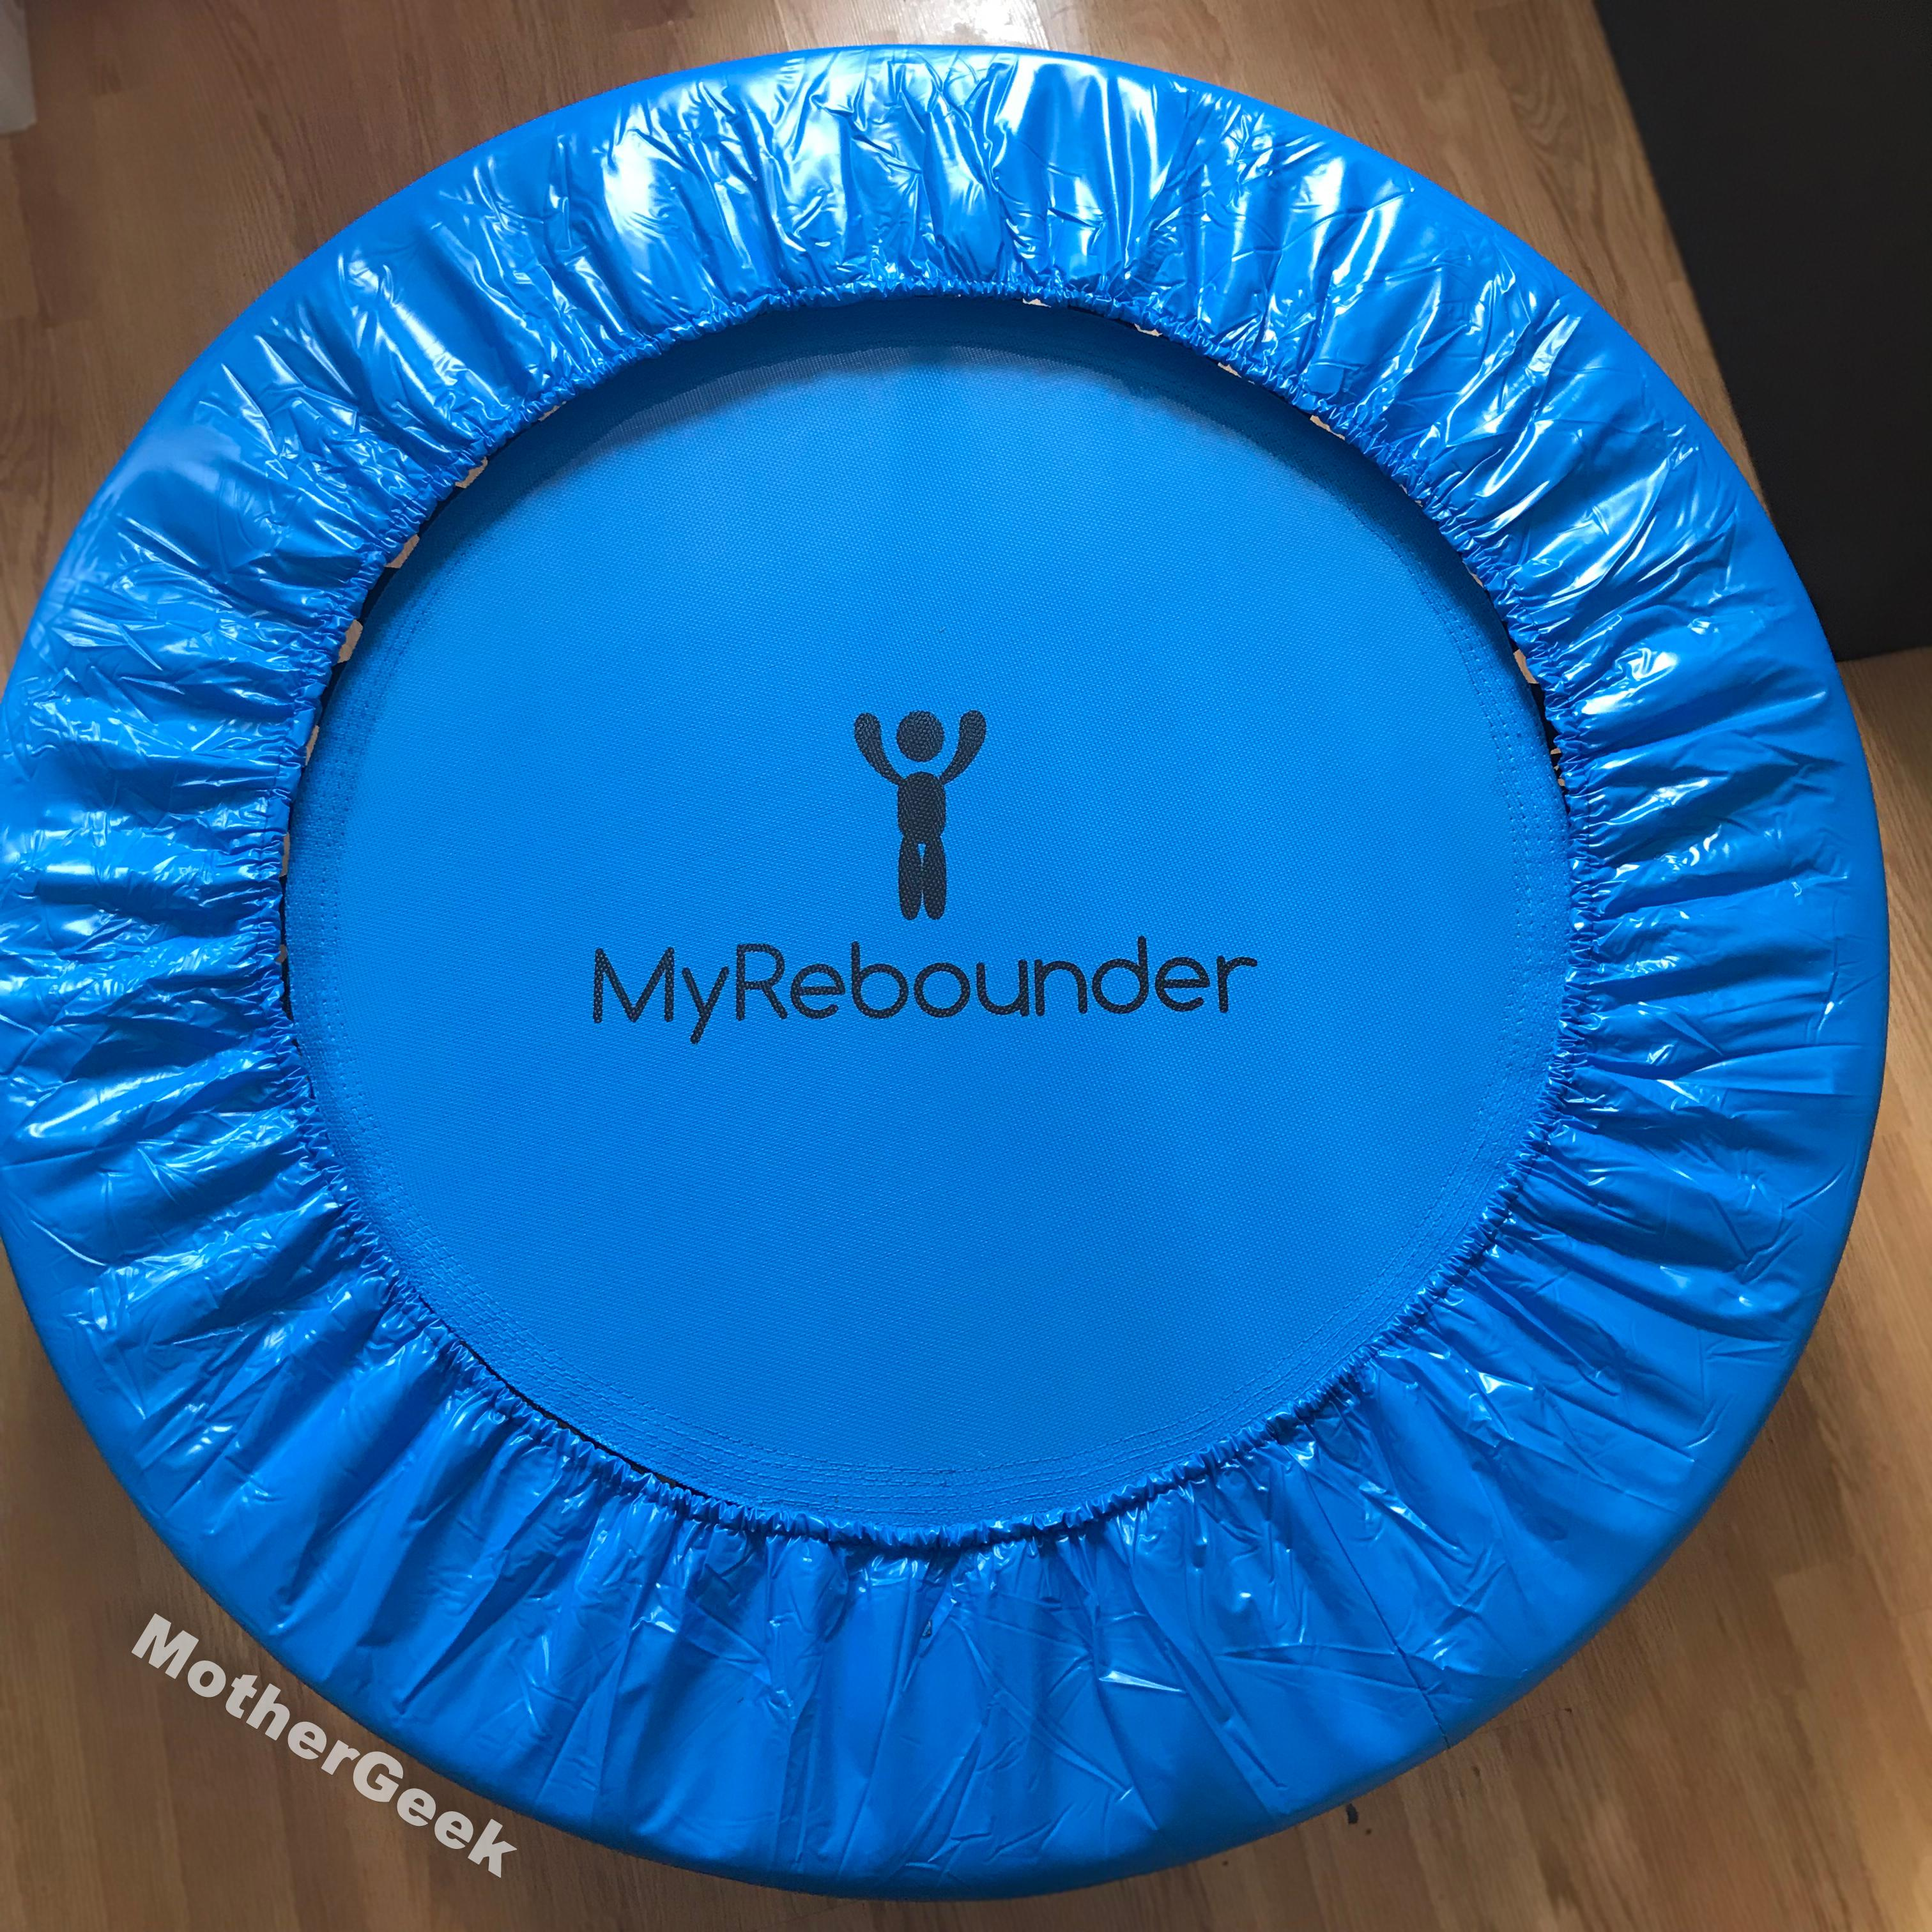 My Rebounder